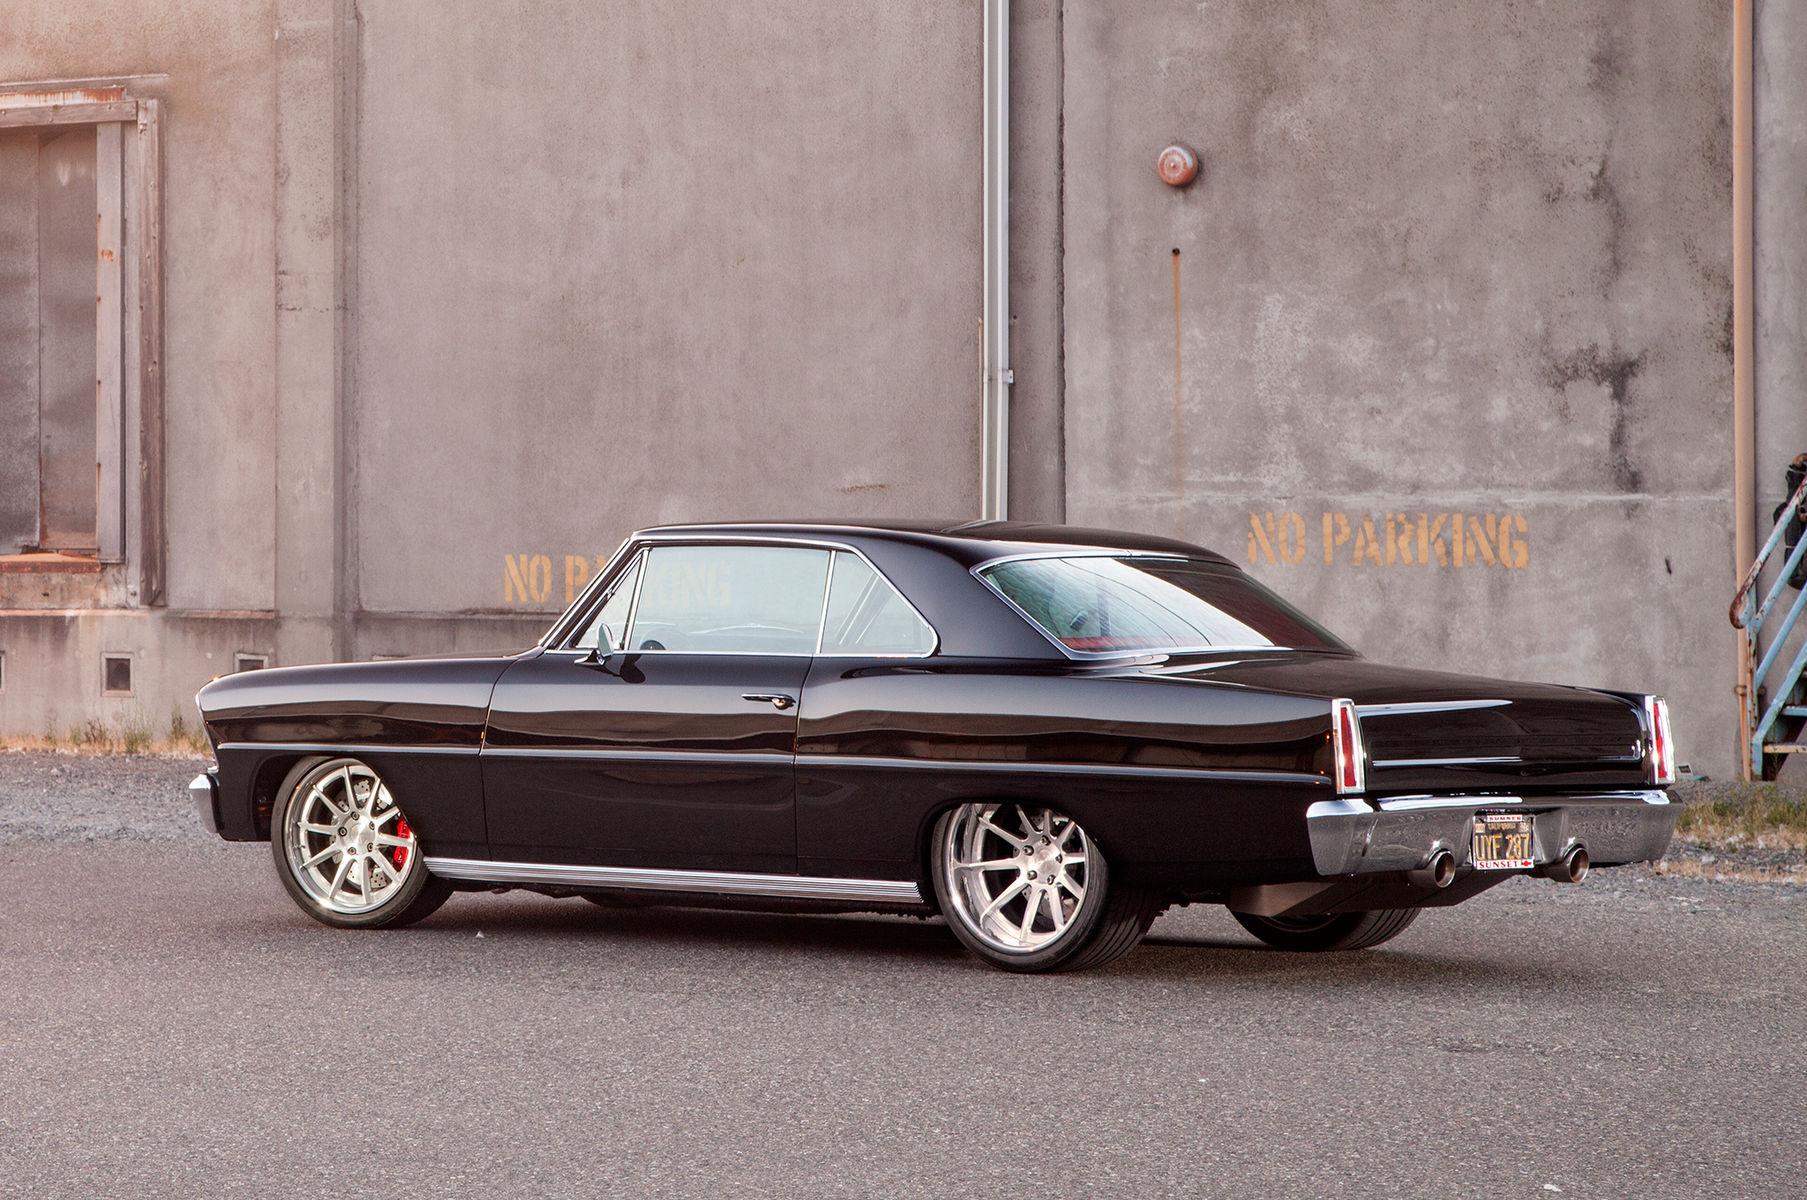 1967 Chevrolet Nova | Nova by Chris Holstrom Concepts on Forgeline RB3C Wheels